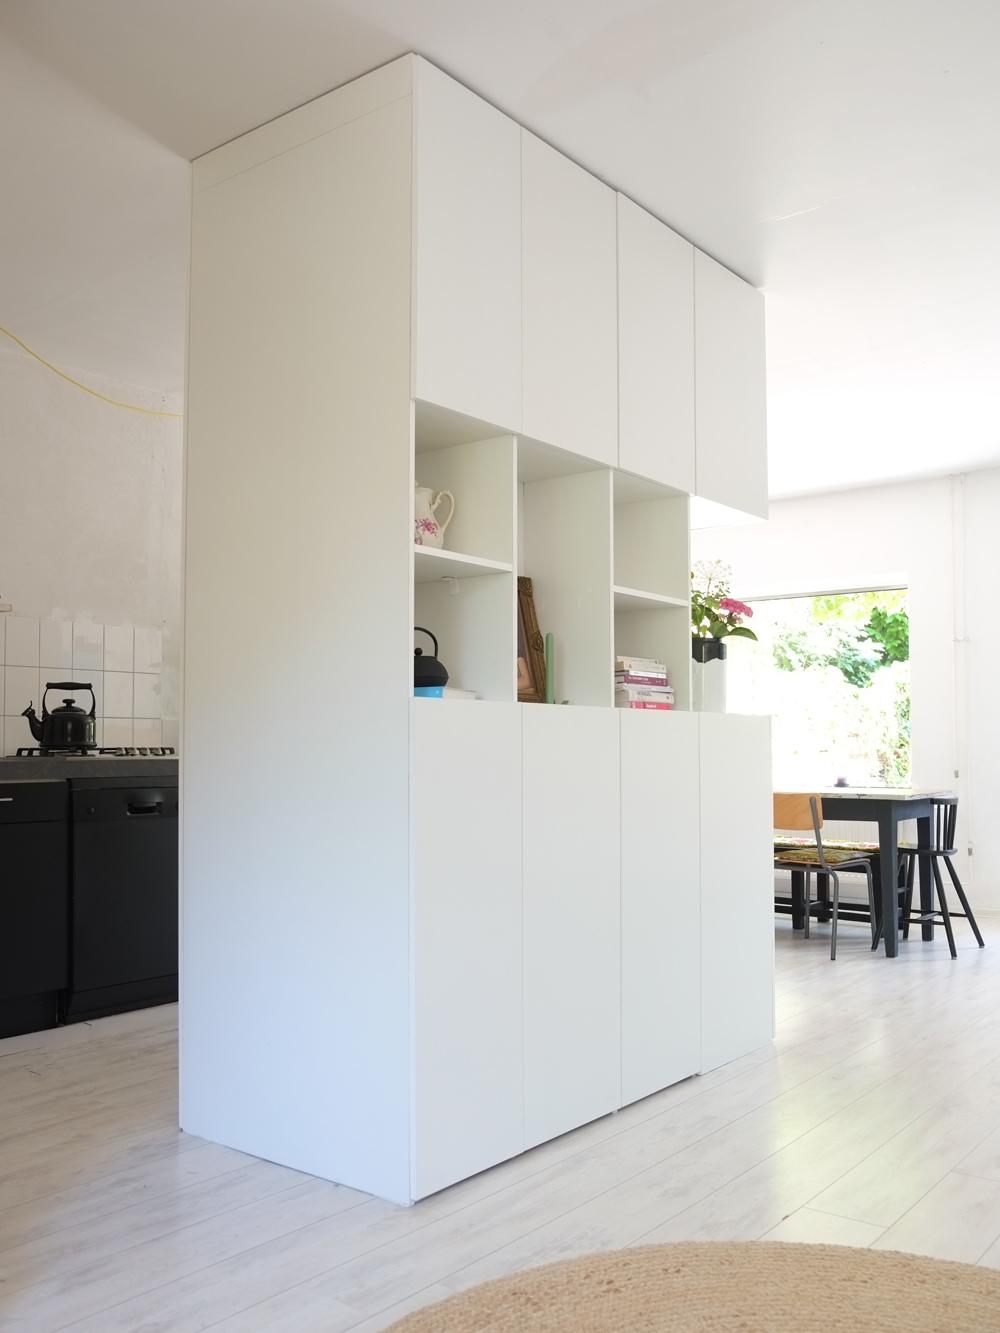 kastopmaat-pimpelwit-interieurontwerp-woonkamer-flexanl-keuken-showhome